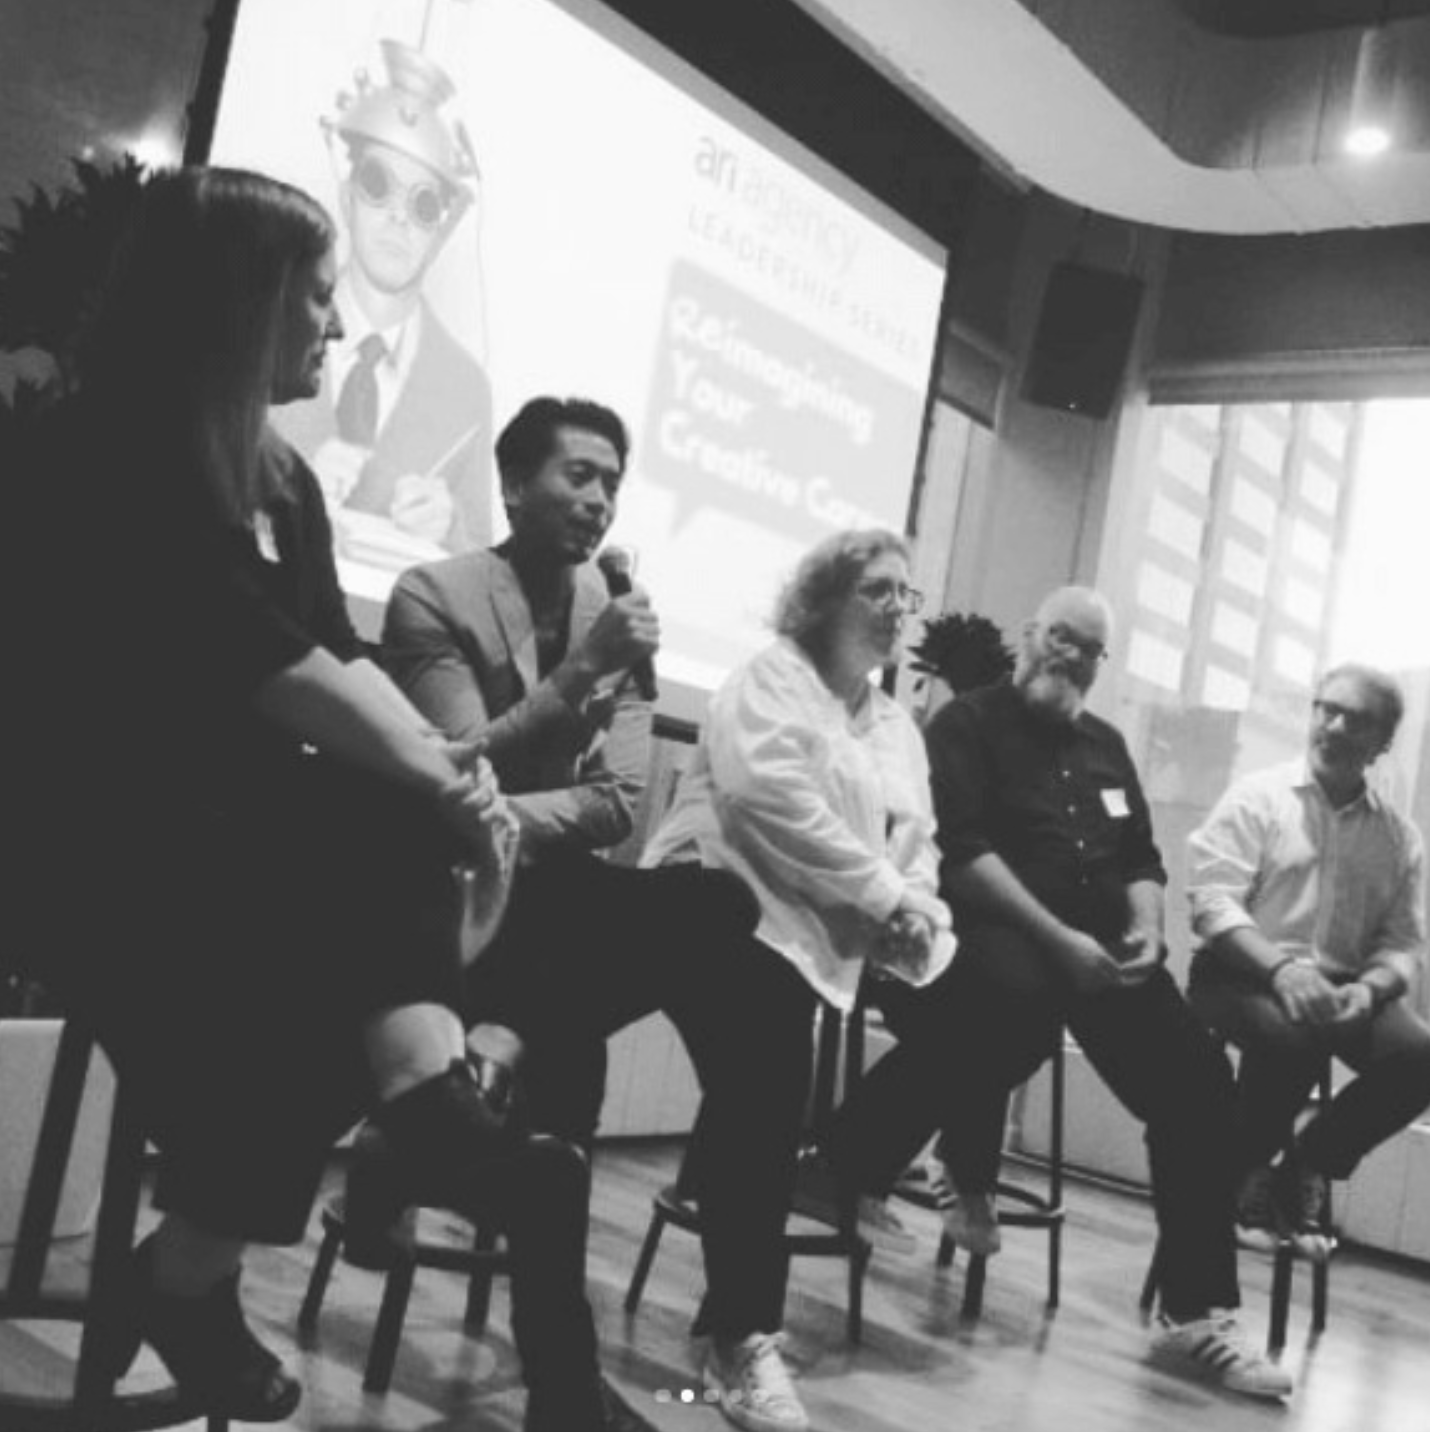 (From Left) Kaye Puhlmann, Israel Diaz, Janice Diner, Dré Labre, Jon Finkelstein